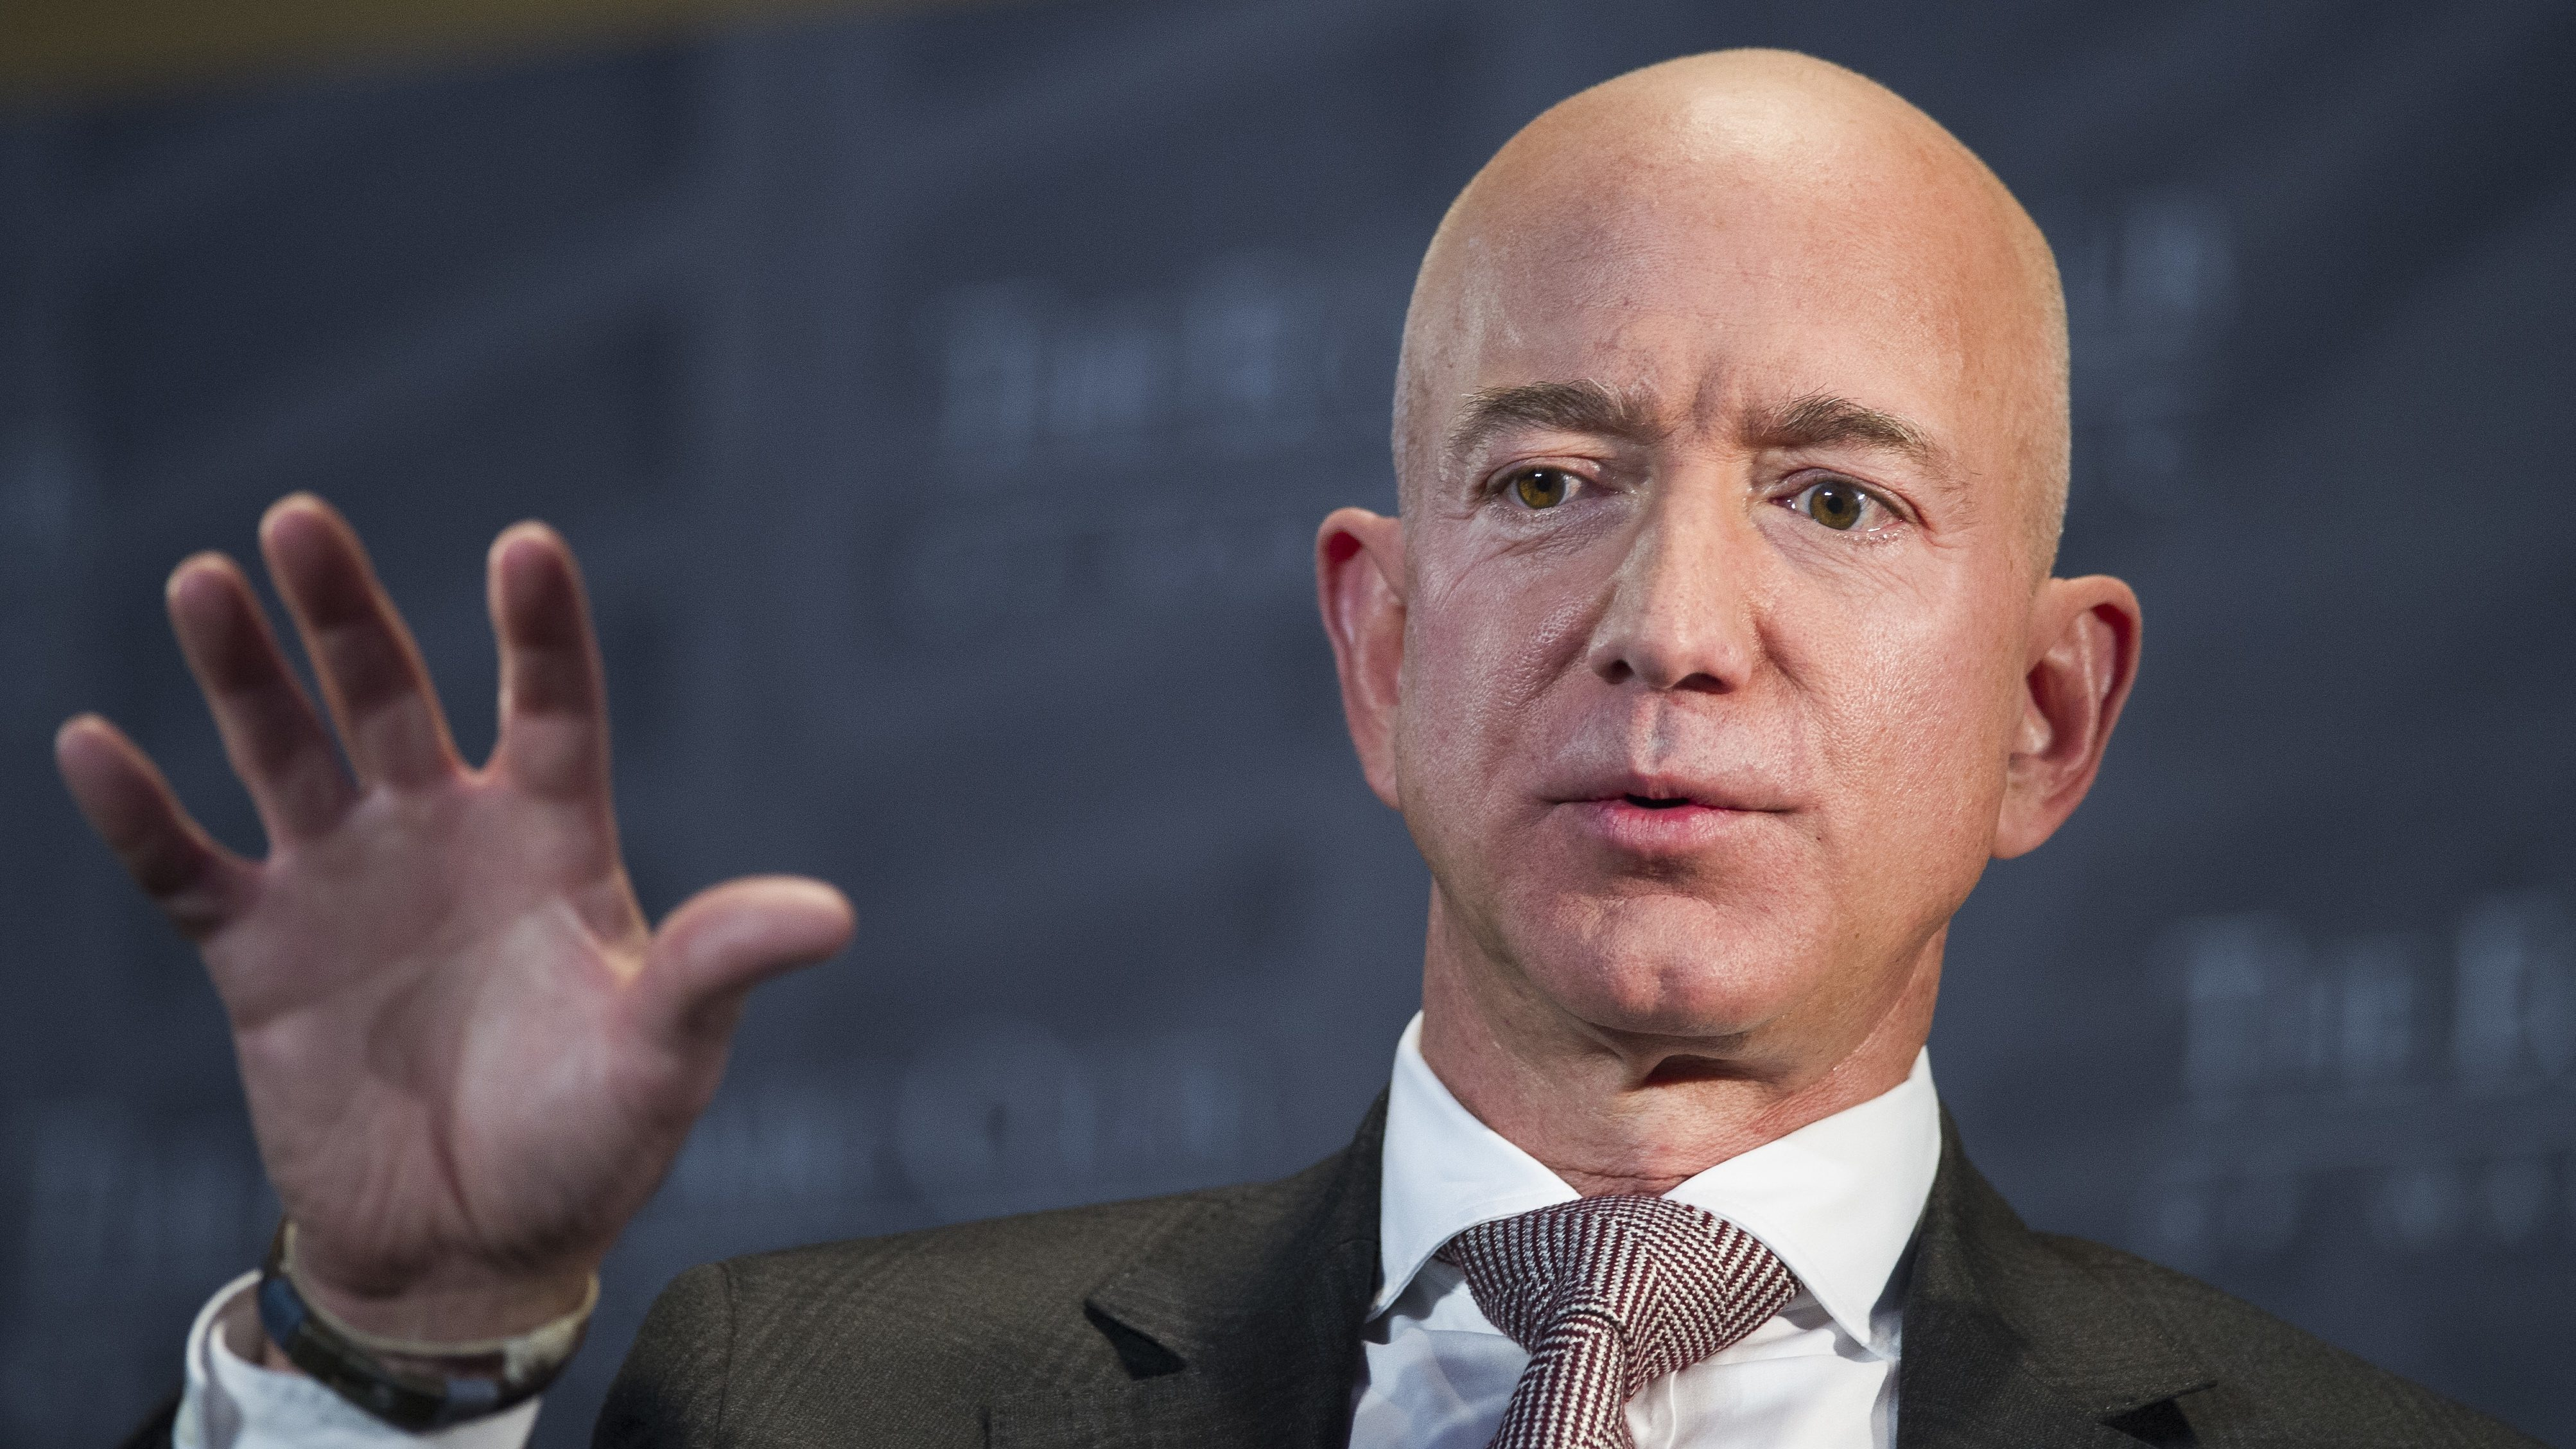 a close up of Jeff Bezos talking